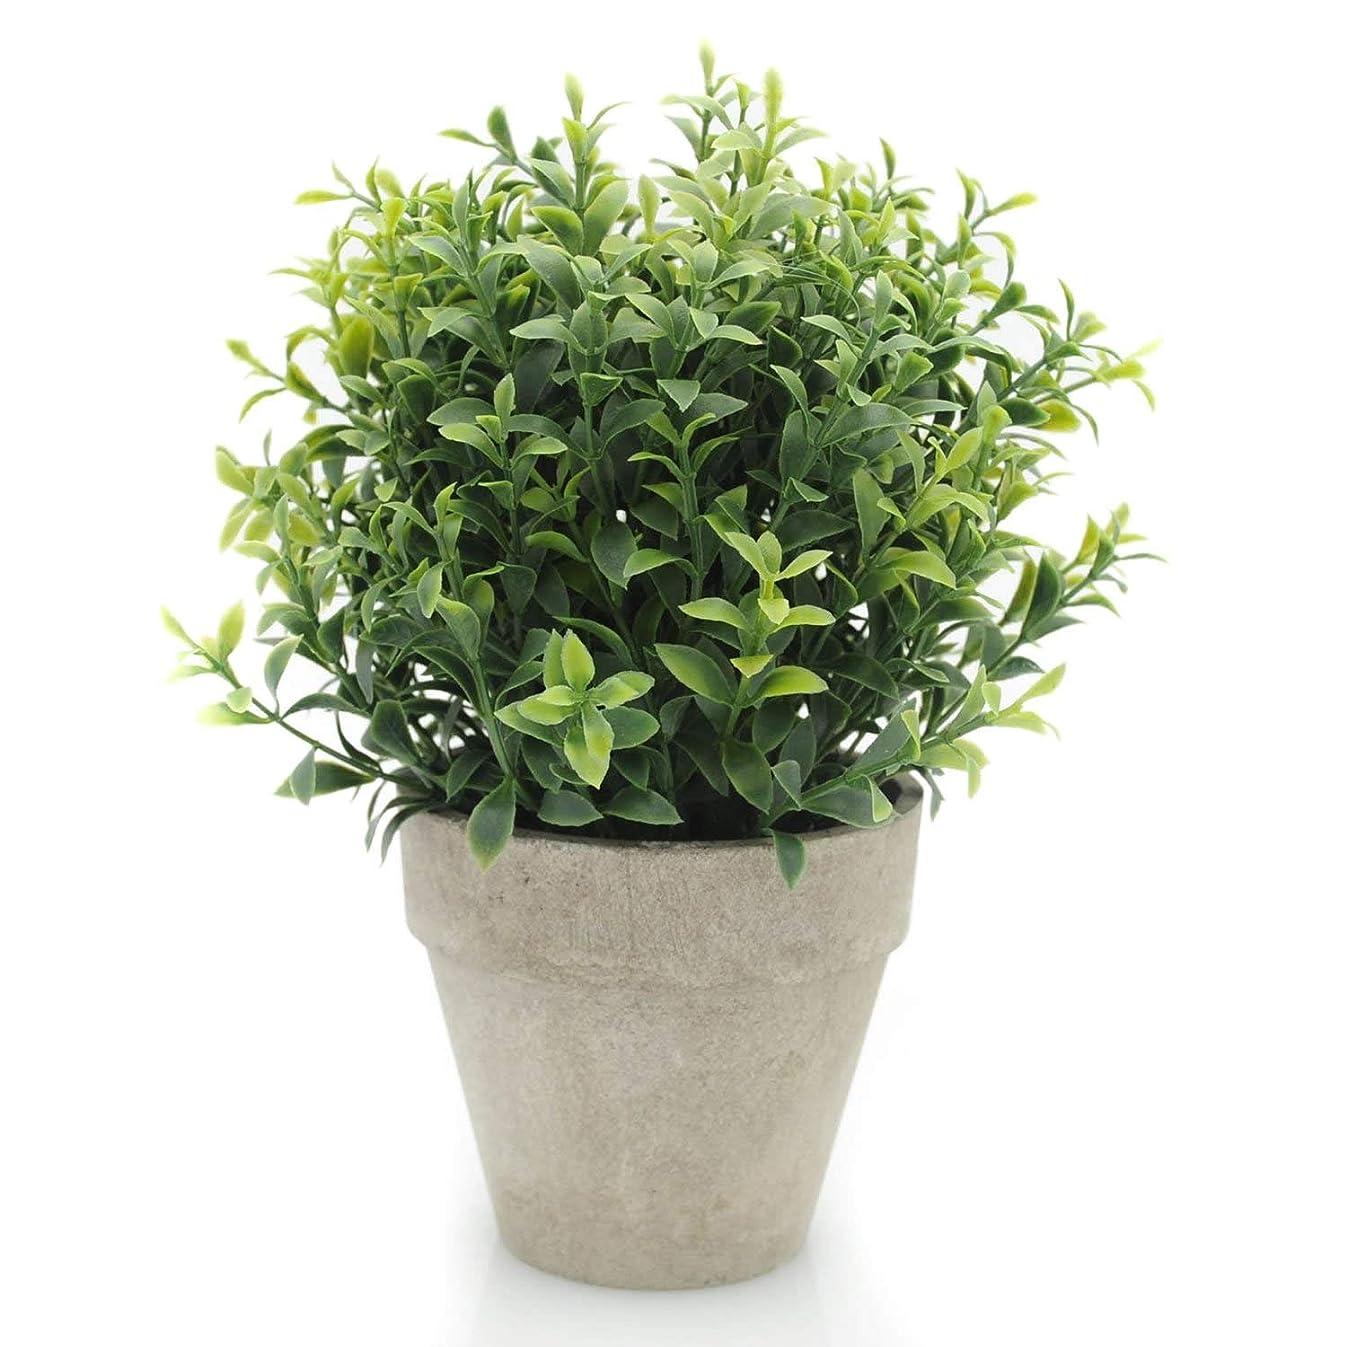 Velener Artificial Plants Mini Potted Grass Arrangements for Home Decor (Green, Seven-Layer)